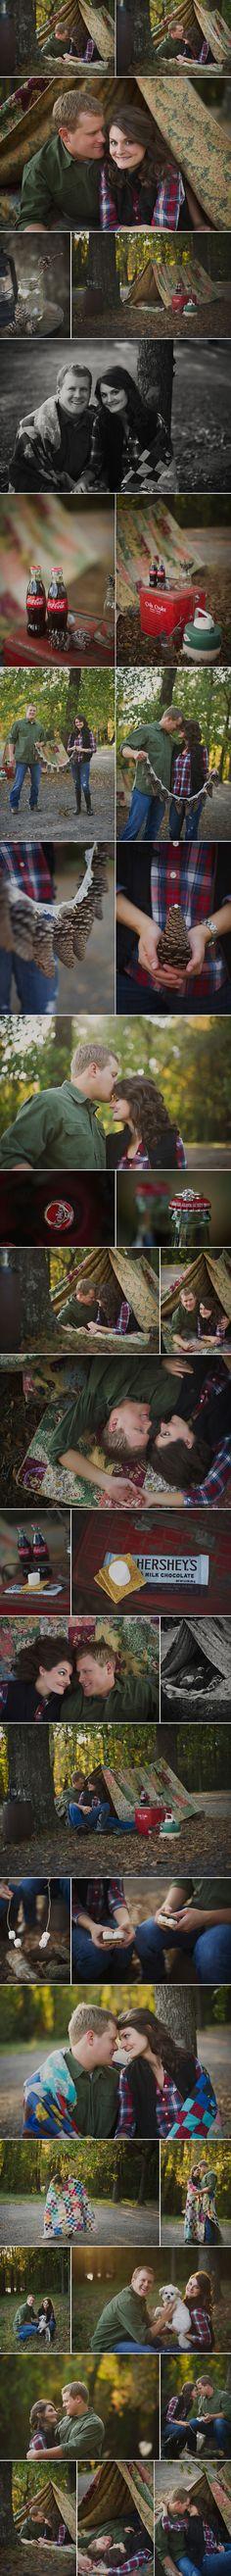 Camping Engagement shoot! LOVVVVVVVVVE it!!